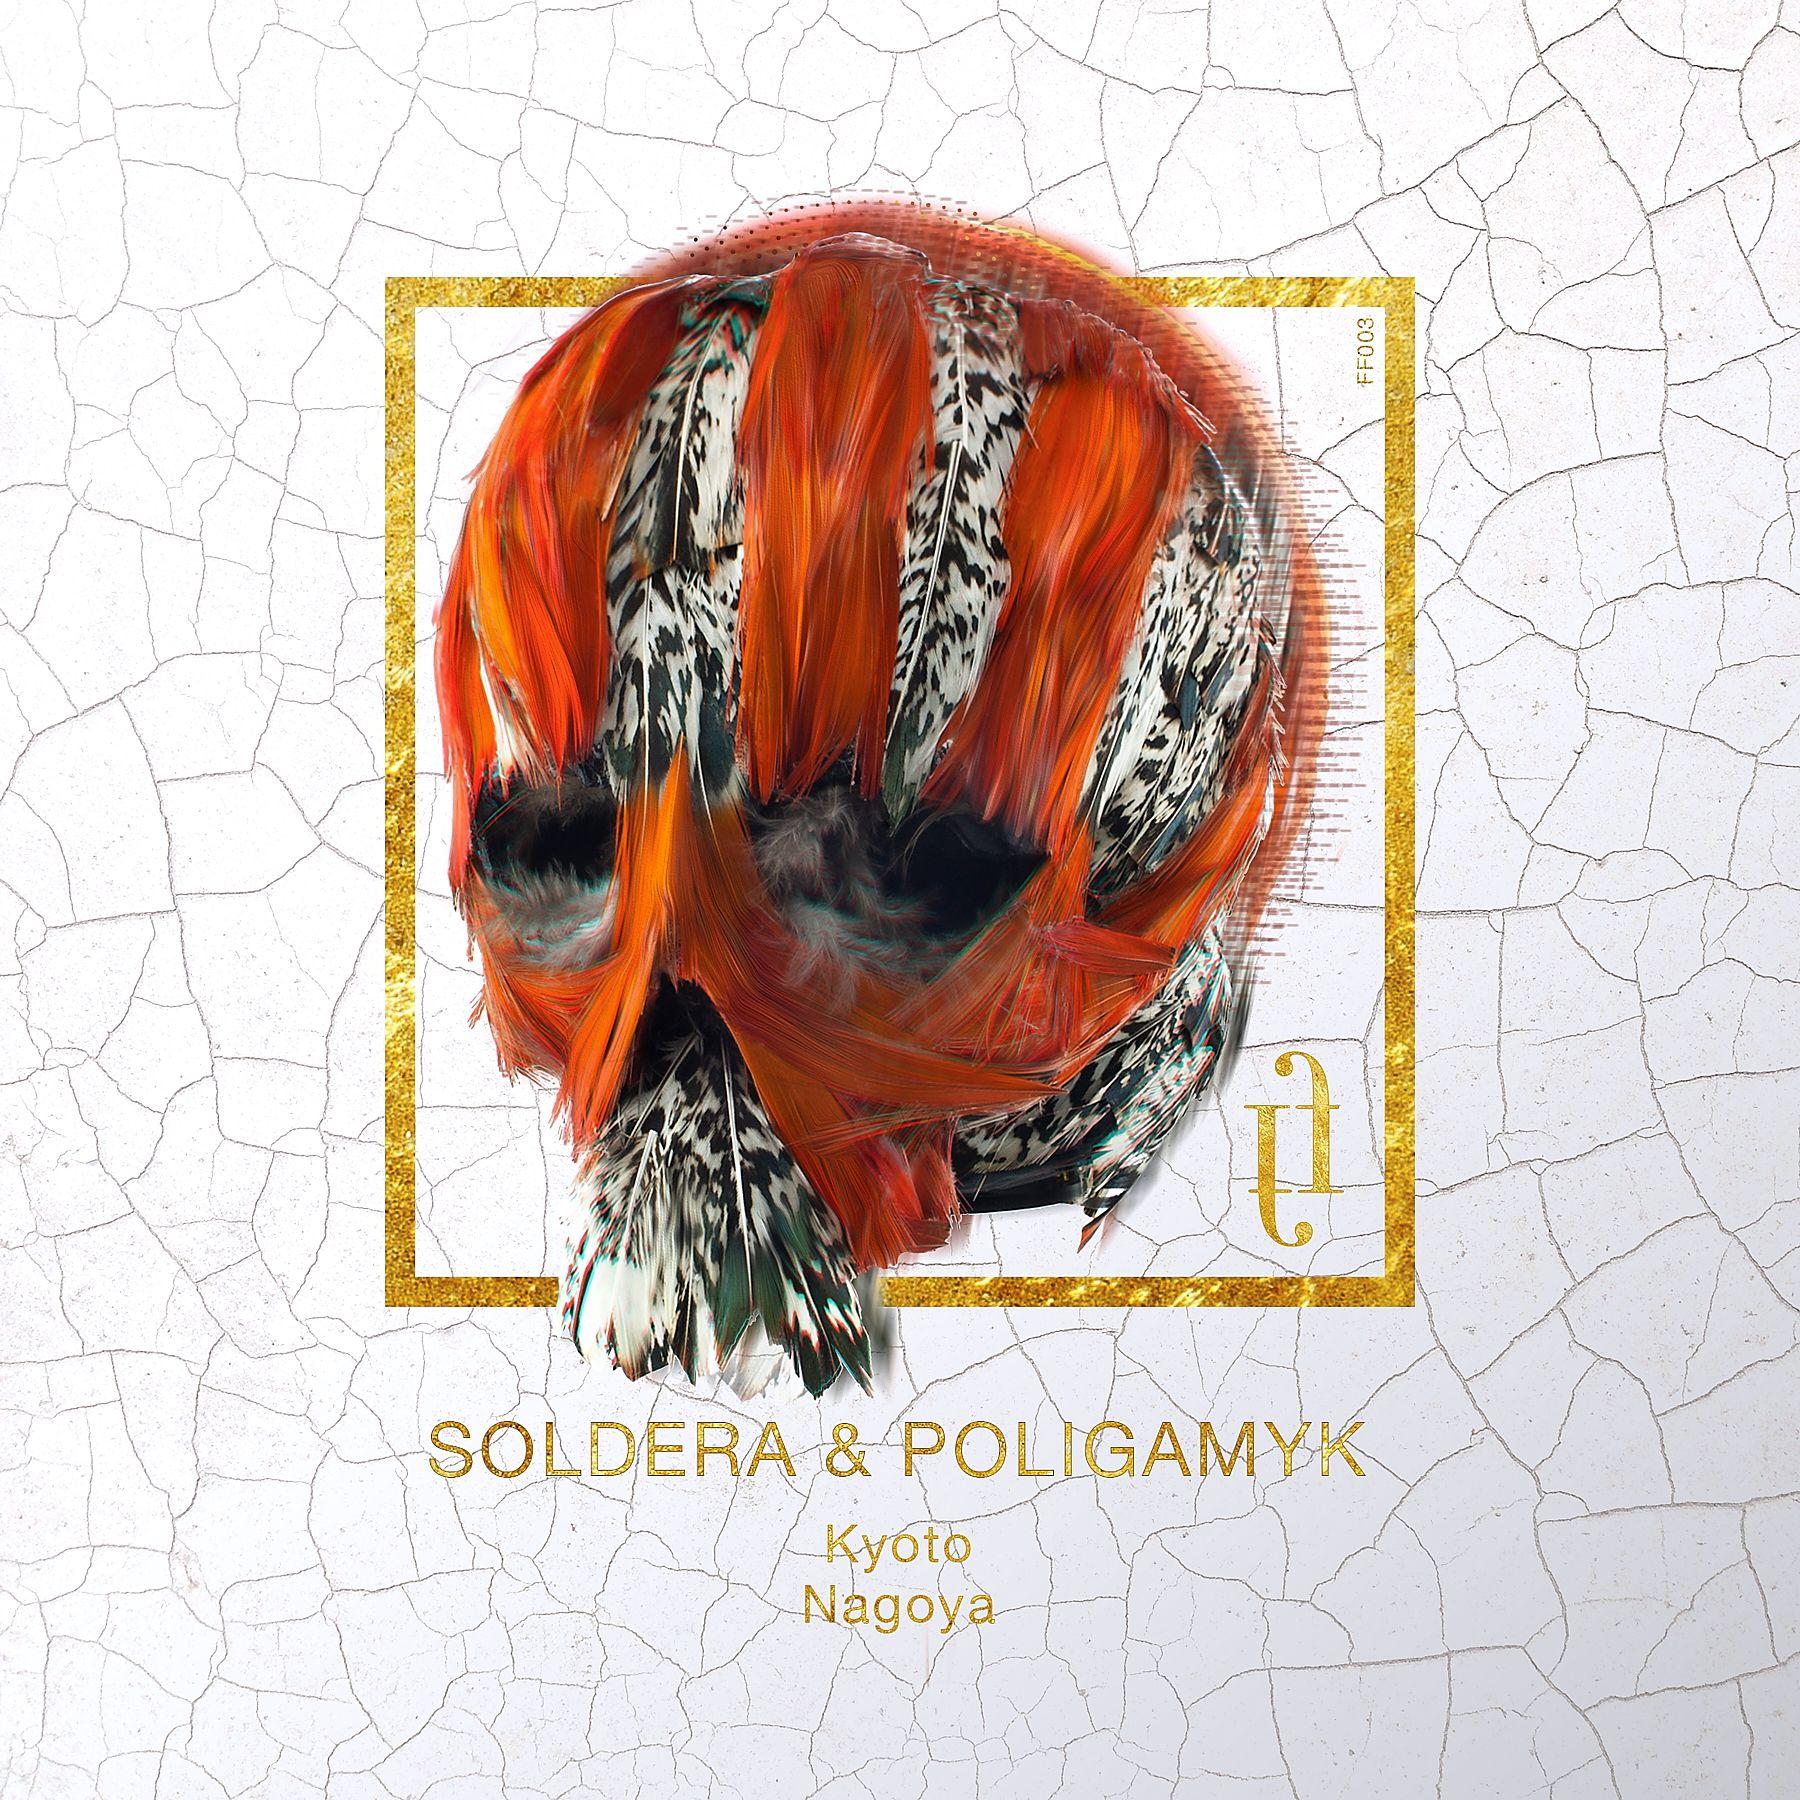 soldera_poligamyk_-_kyoto_ff003_coverart.jpg